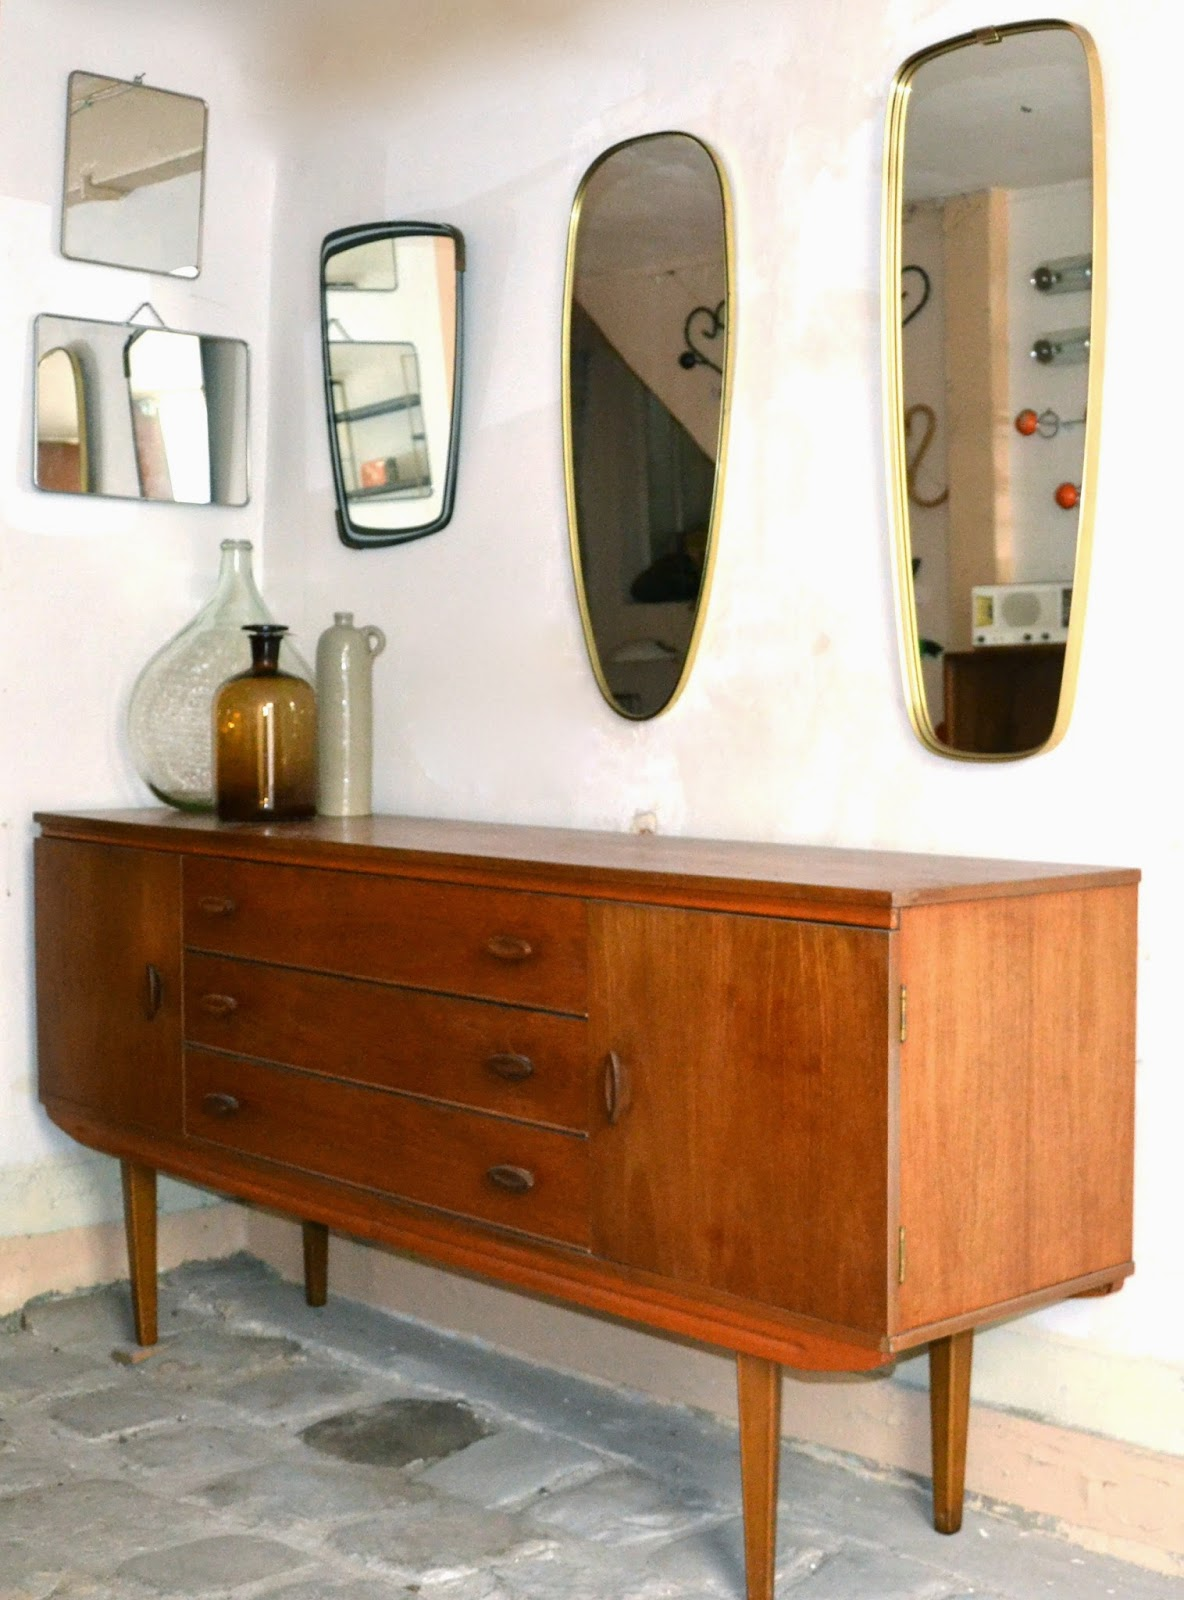 Bindies miroirs mes beaux miroirs for Beaux miroirs